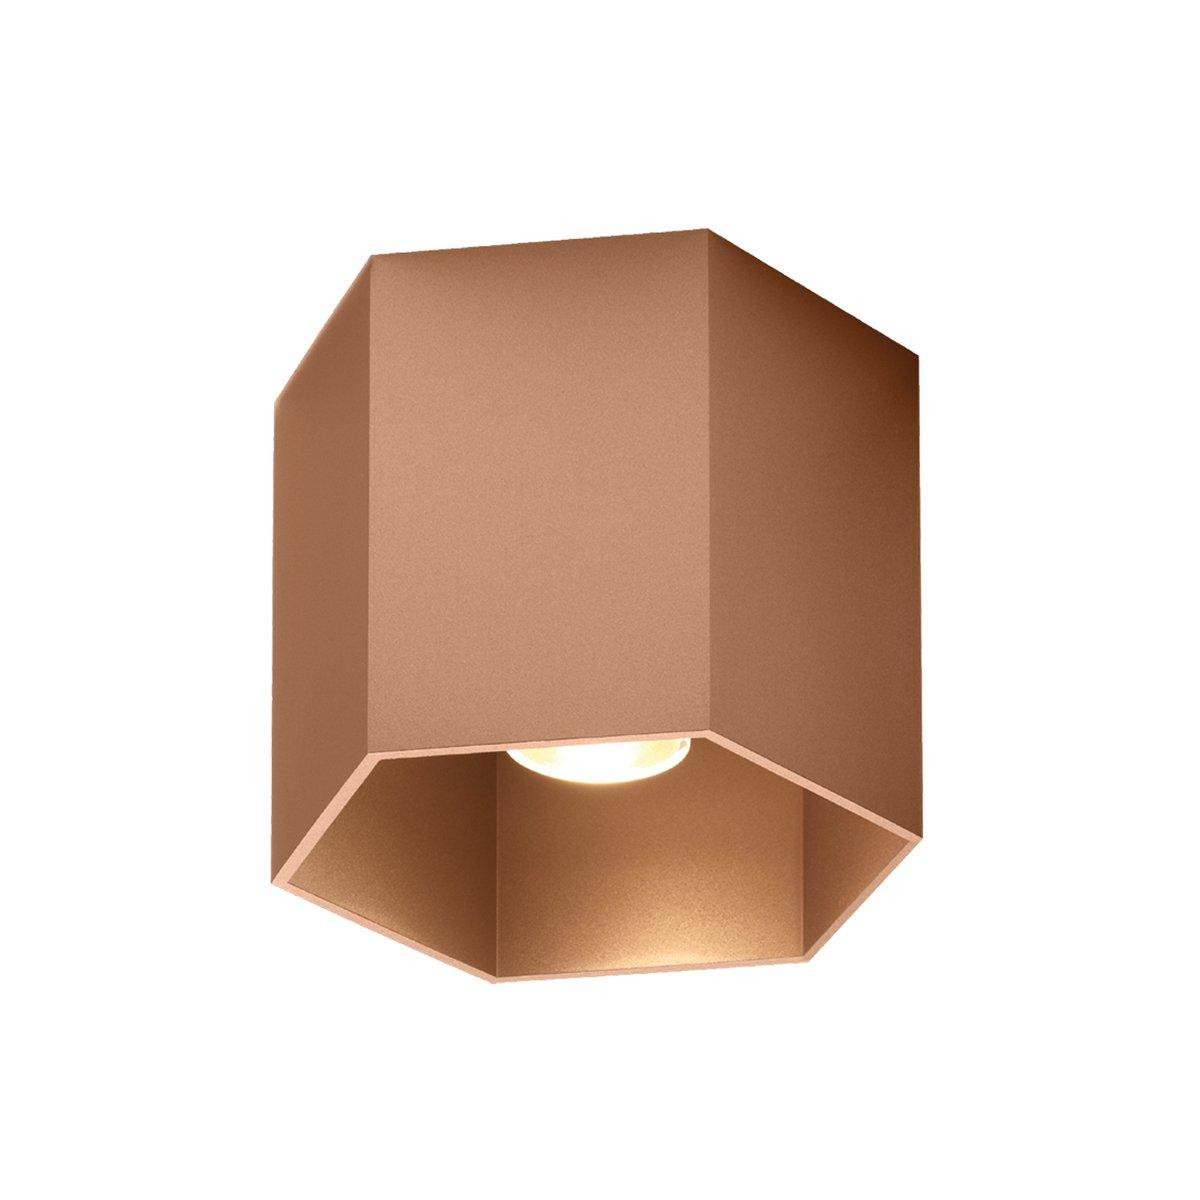 Wever & Ducr� Hexo 1.0 Plafondlamp Copper - GU10